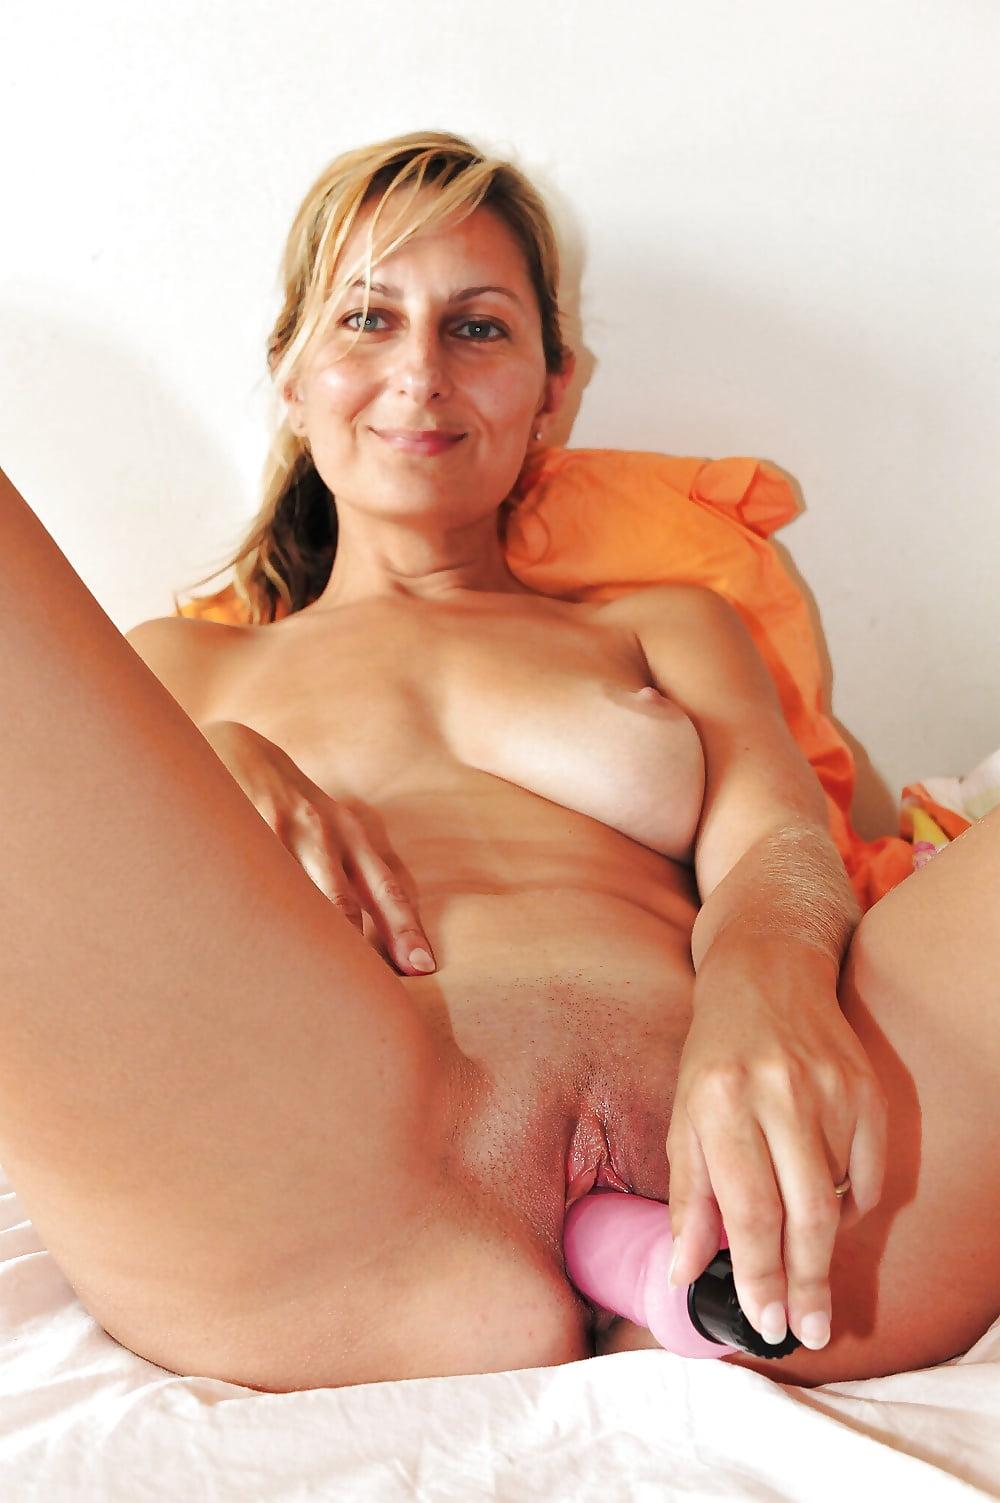 Одинокая мамочка ххх — pic 1